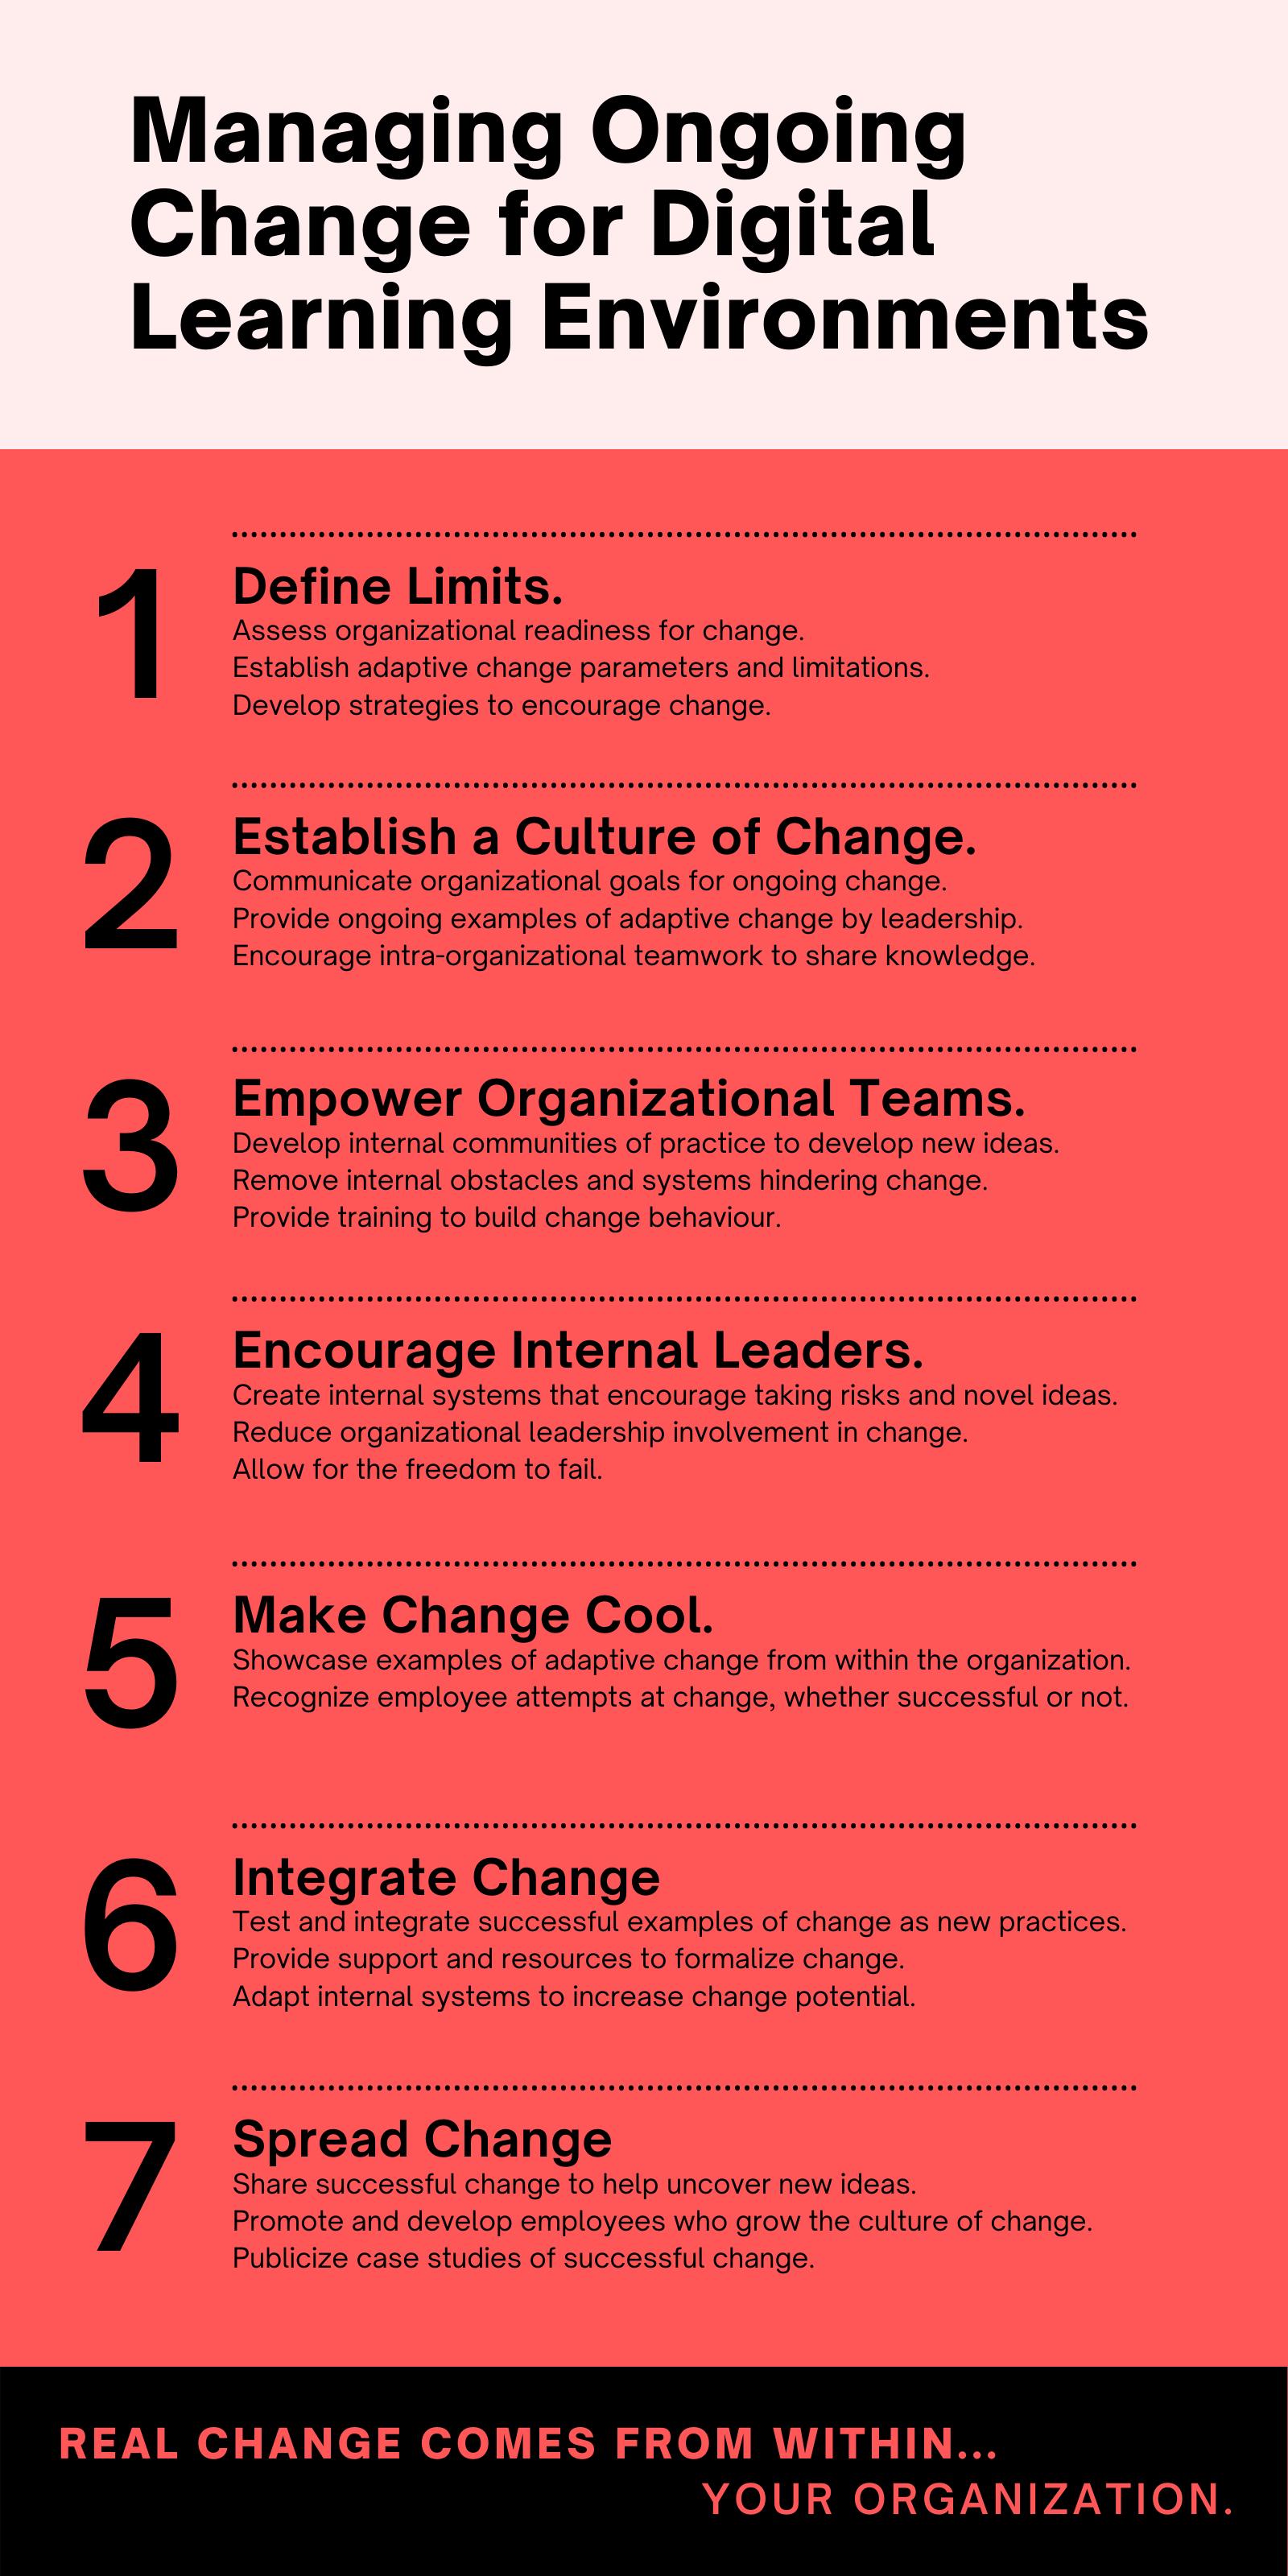 Managing Ongoing Change